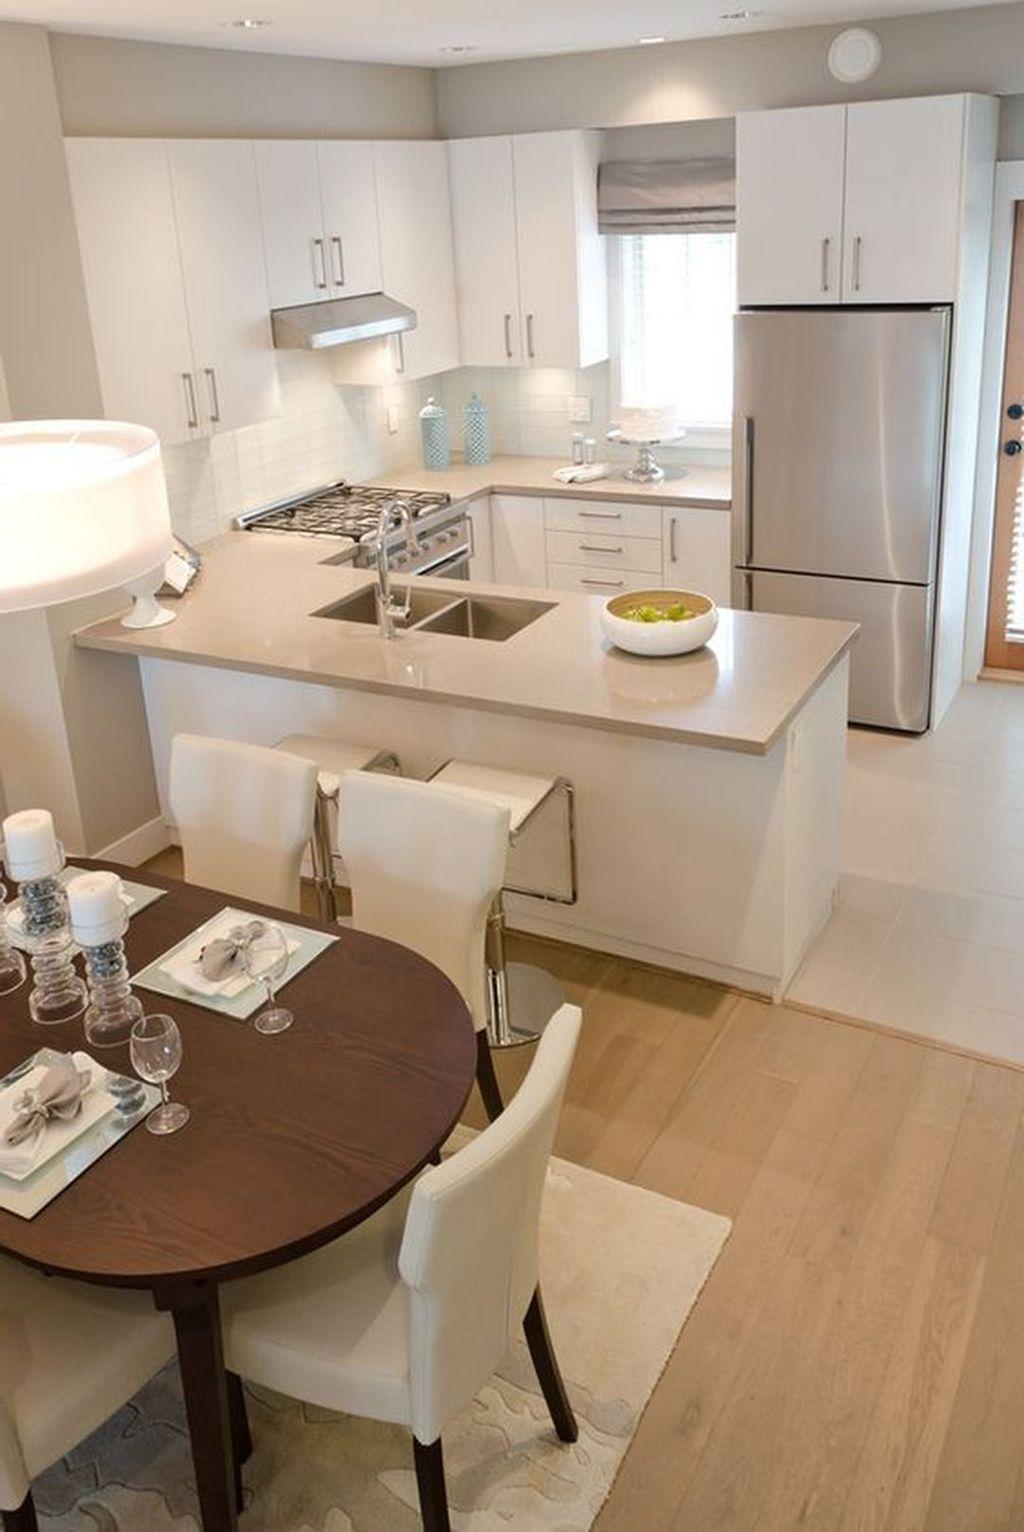 32 Popular Small Apartment Kitchen Ideas Popy Home Small Modern Kitchens Kitchen Design Small Small Apartment Kitchen